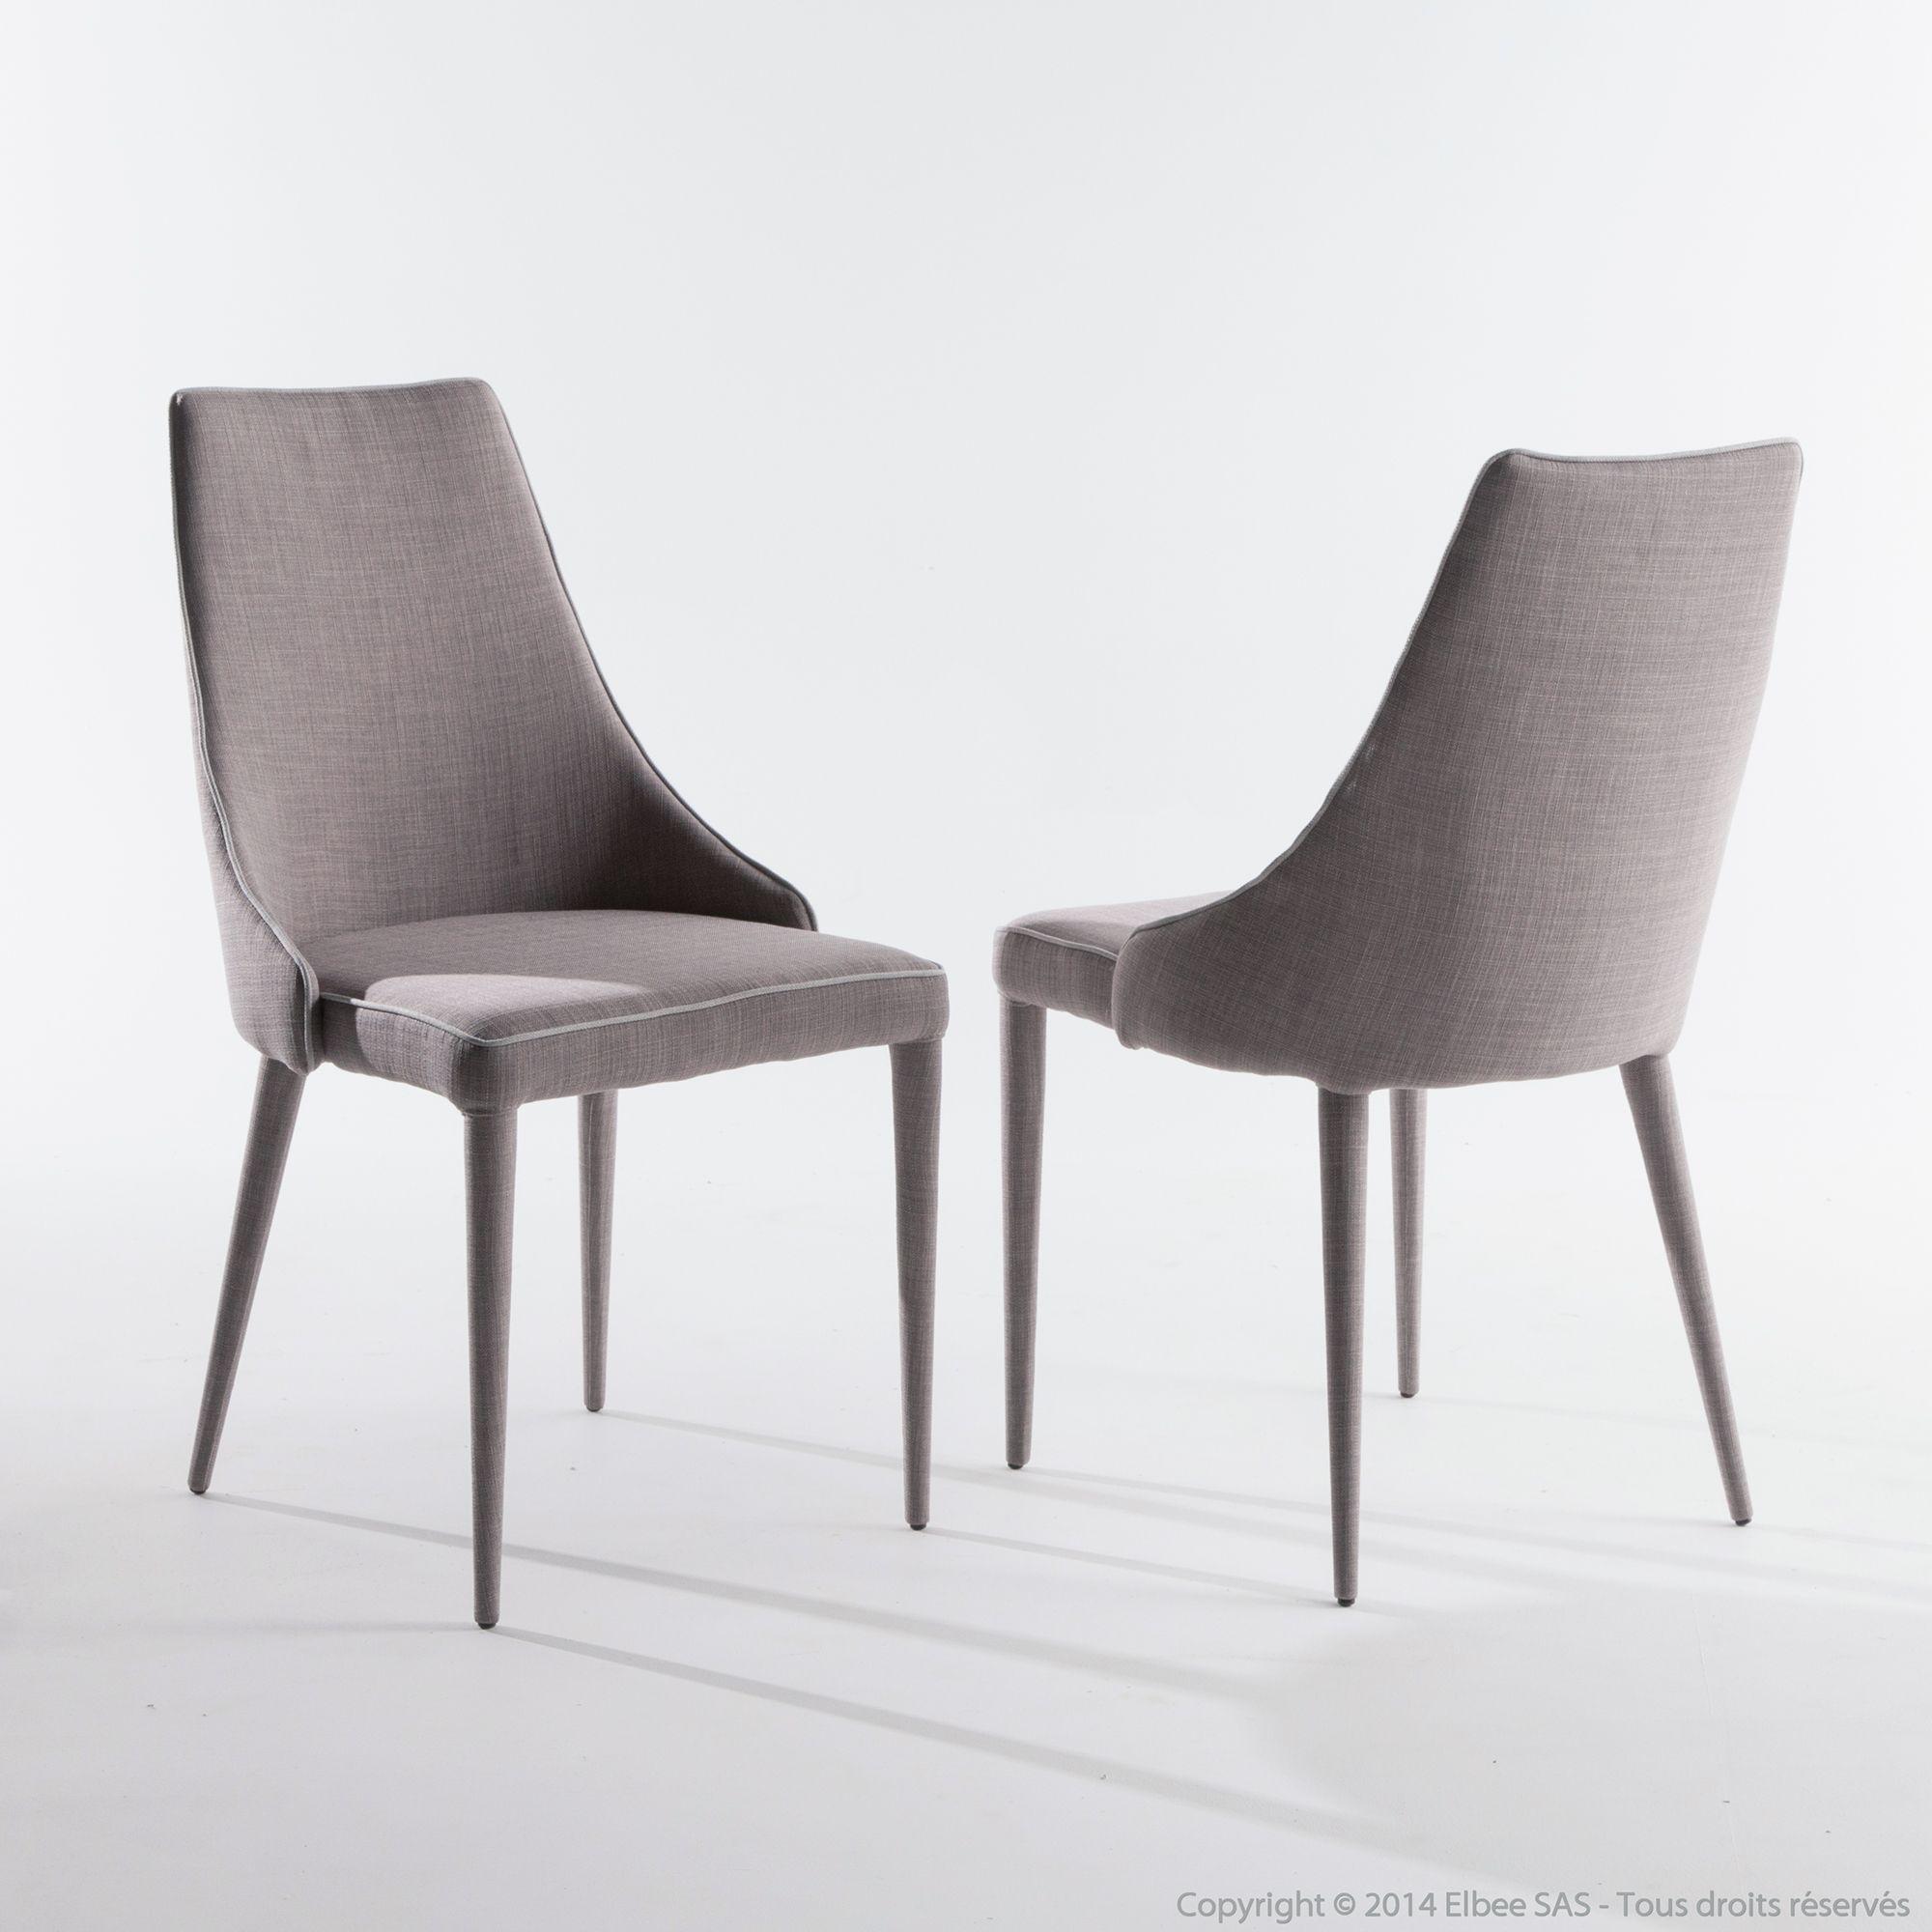 completely new code reduction la redoute port gratuit tactics. Black Bedroom Furniture Sets. Home Design Ideas